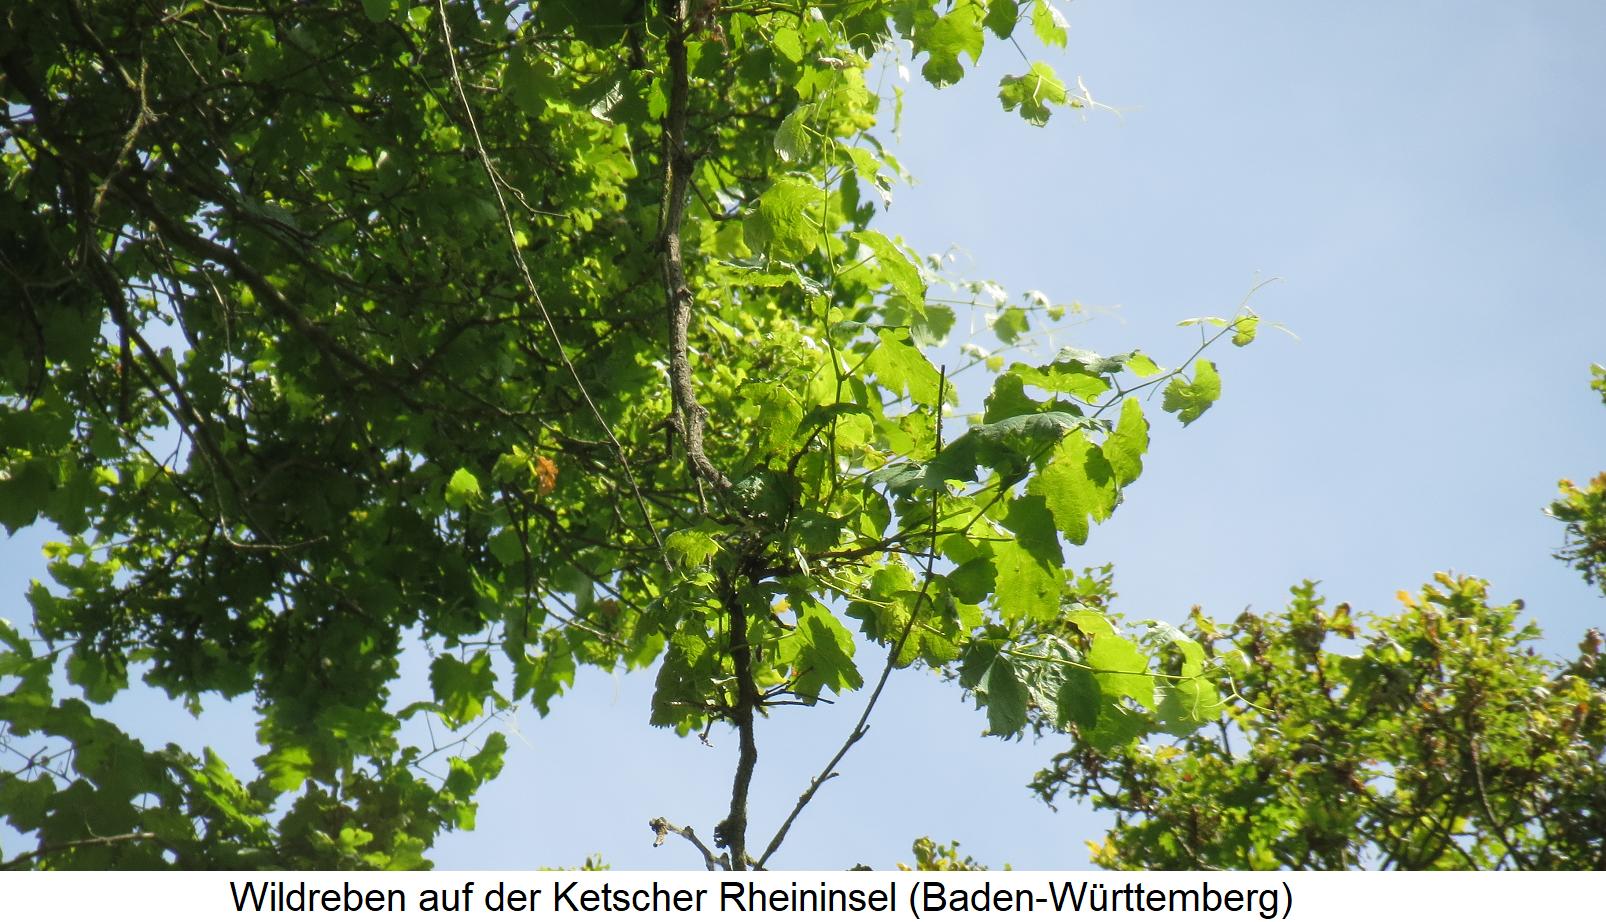 Wild grapes on the Ketscher Rheininsel (Baden-Württemberg)